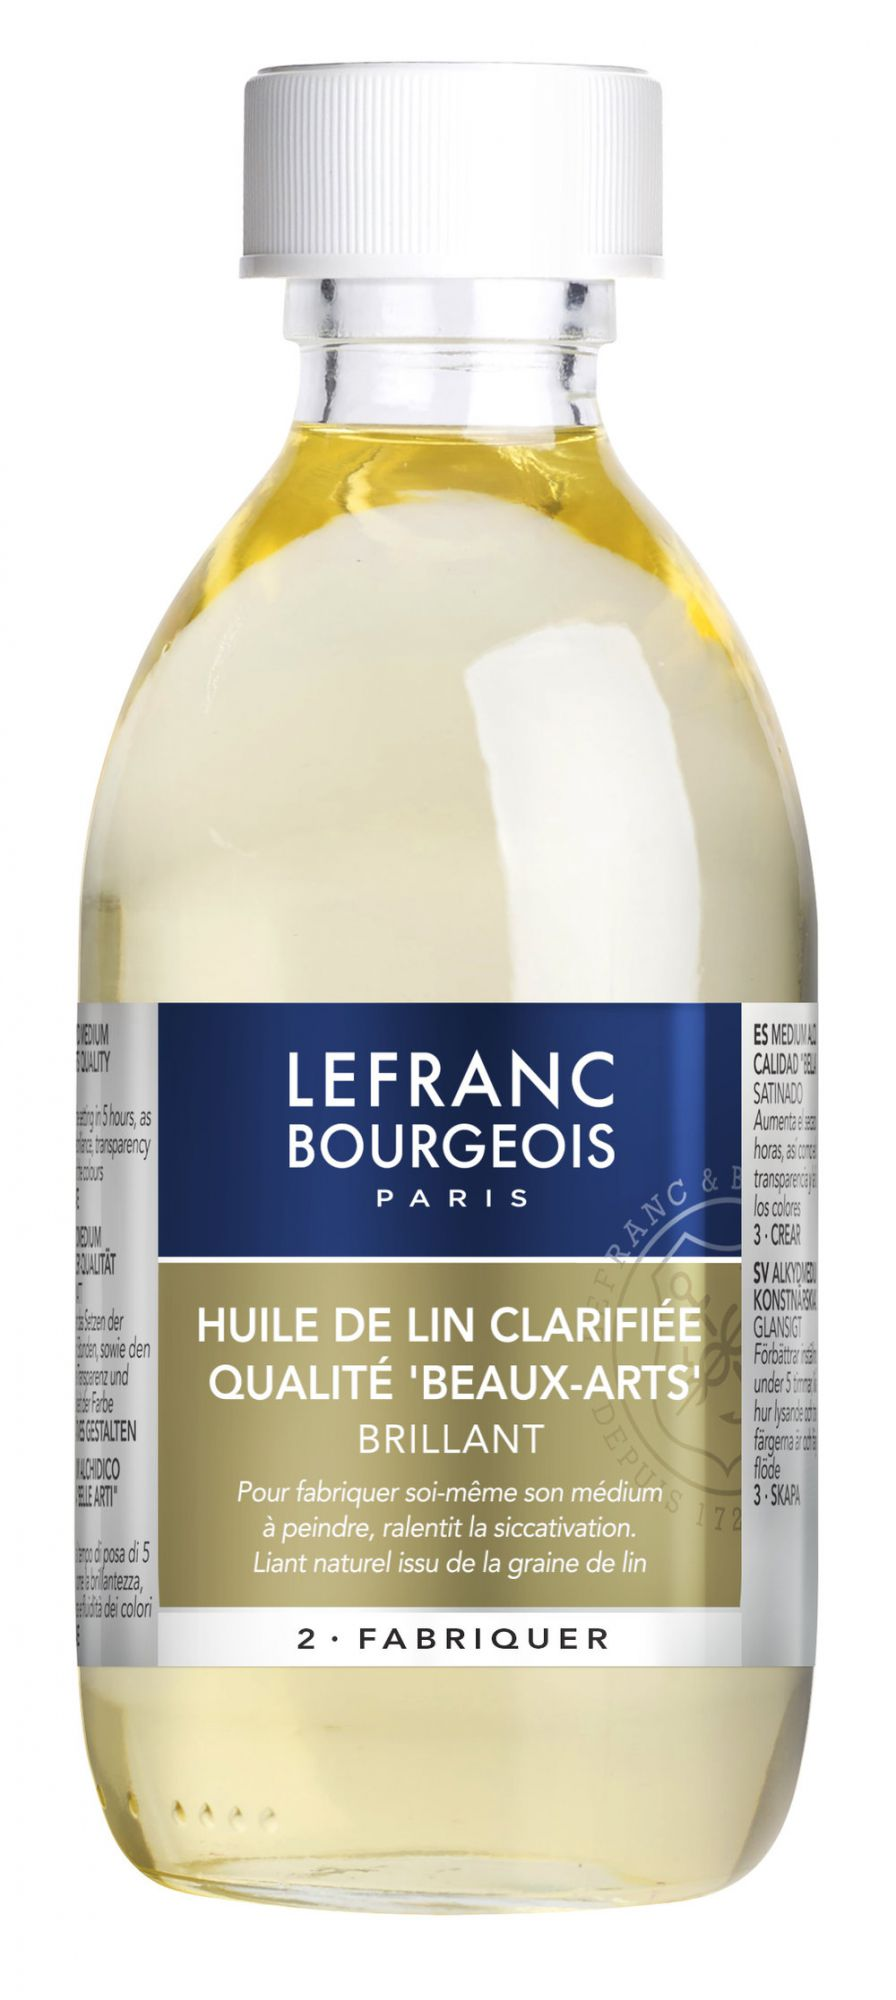 HUILE DE LIN CLARIFIEE 250 ML LEFRANC & BOURGEOIS